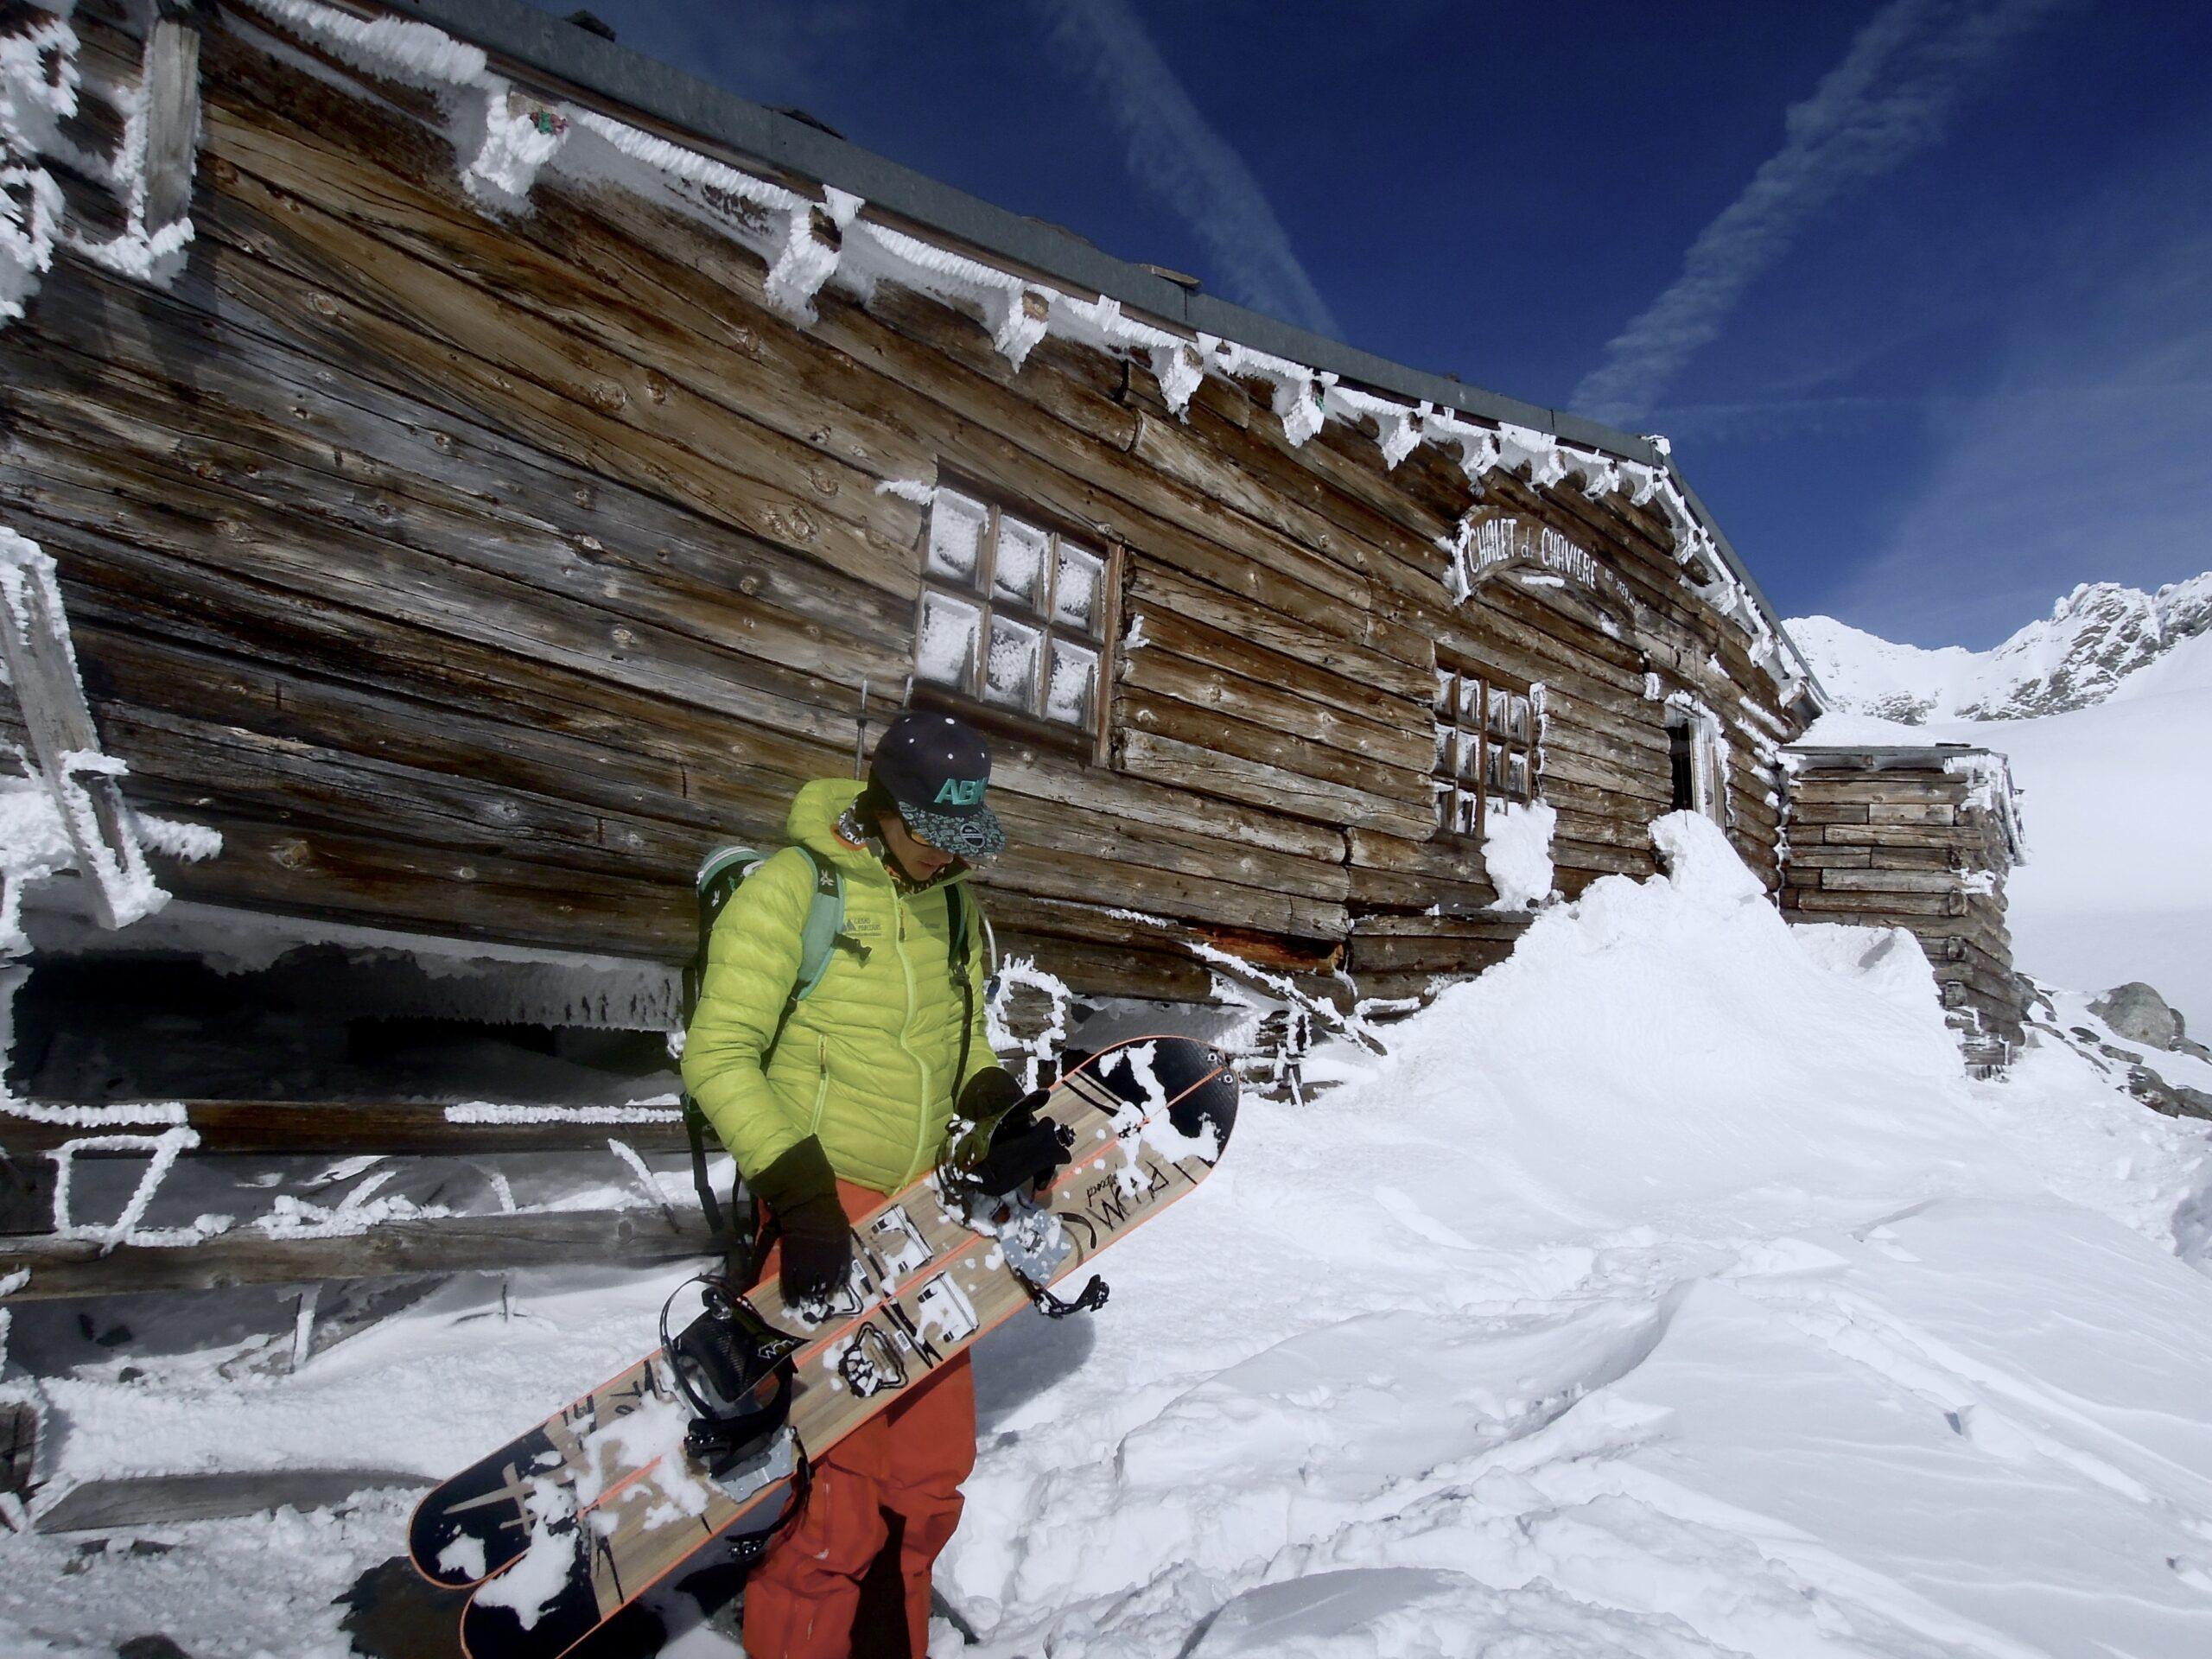 Val-Thorons, Plum, Splitboard, Léo Wattebled, Neige, snow, ice, alpinisme